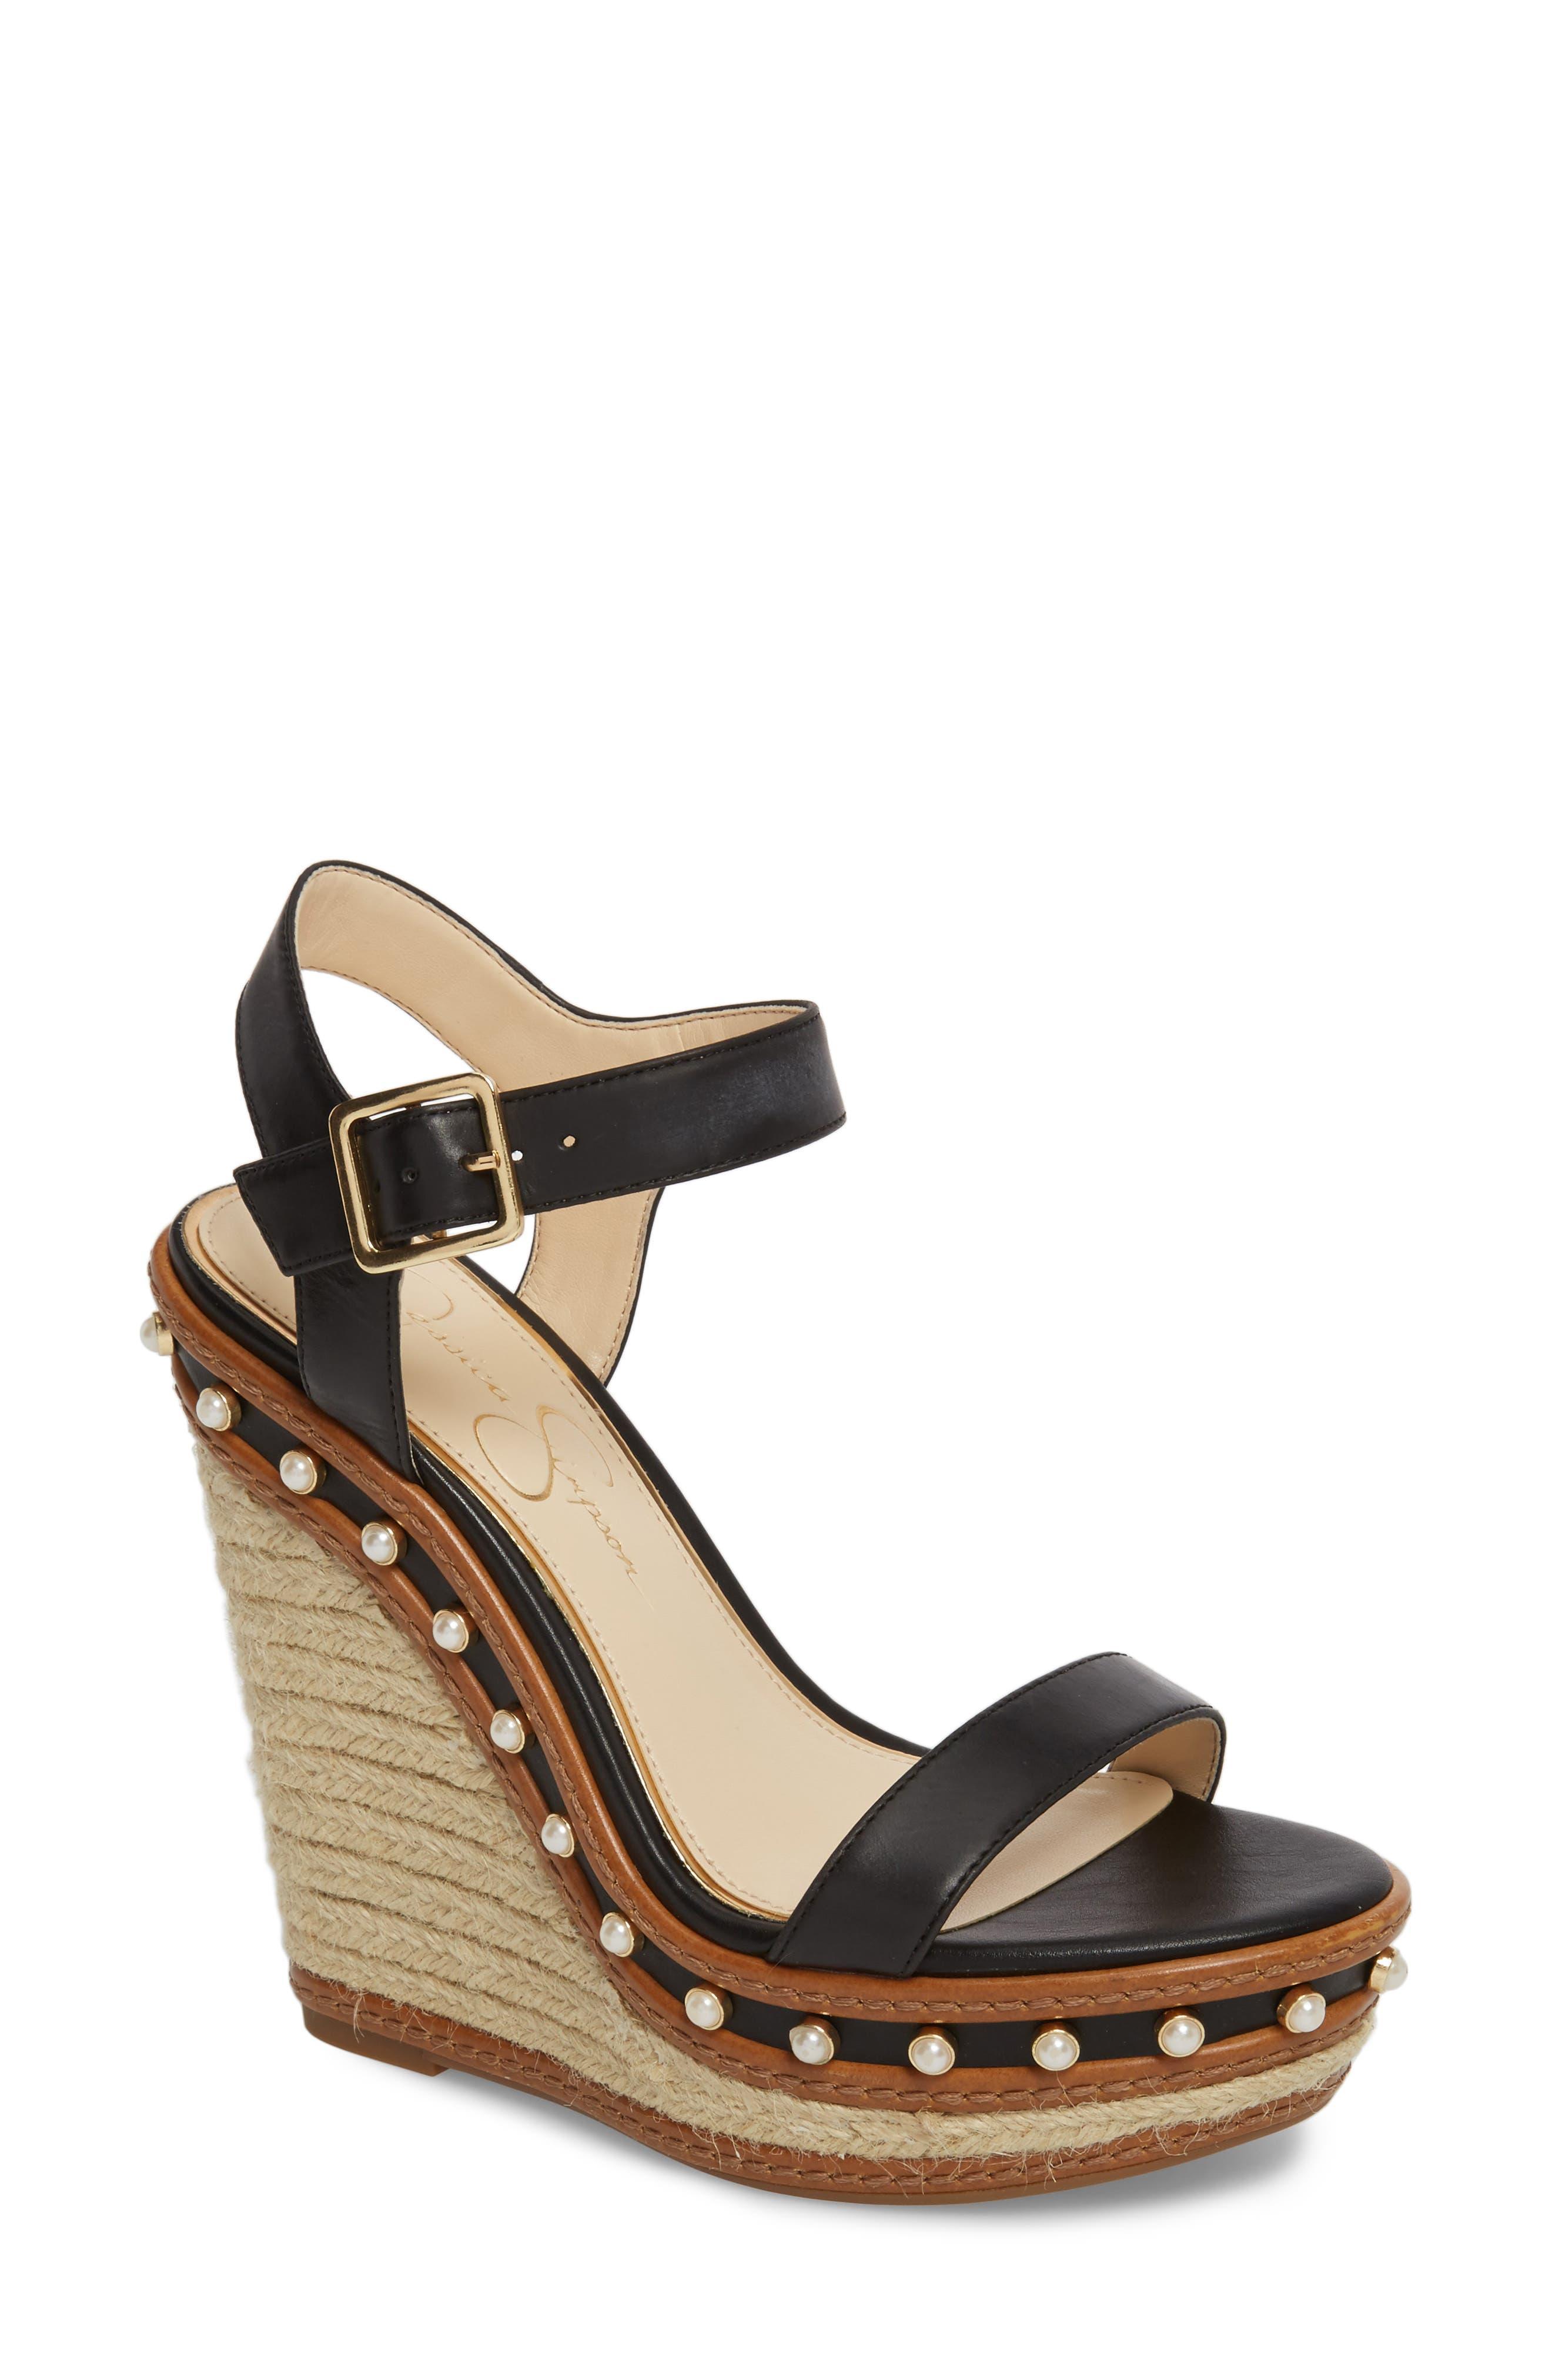 Jessica Simpson Arly Espadrille Wedge Sandal (Women)